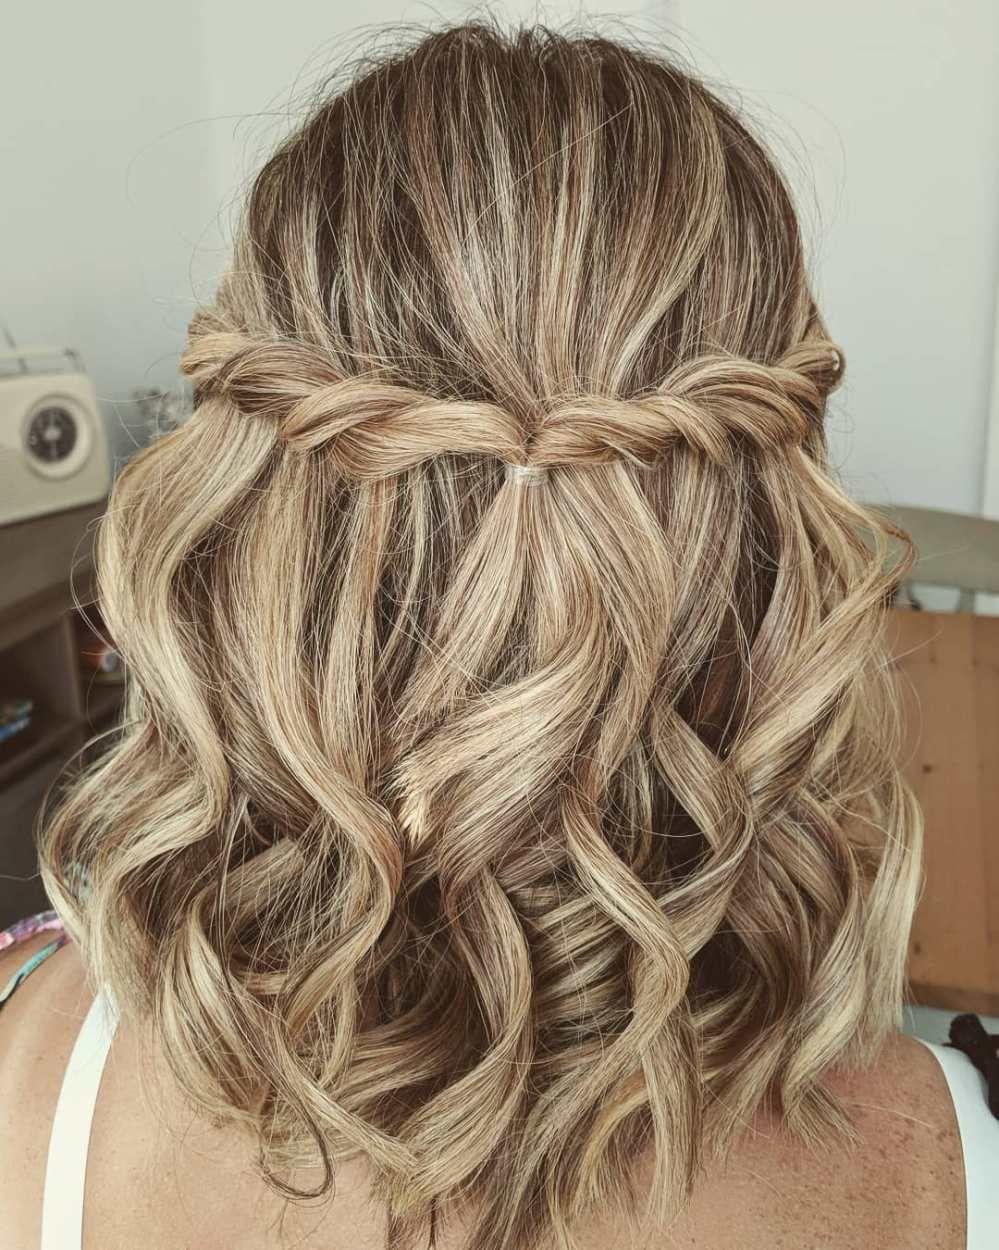 60 Trendiest Updos For Medium Length Hair Formal Hairstyles For Short Hair Updos For Medium Length Hair Up Dos For Medium Hair